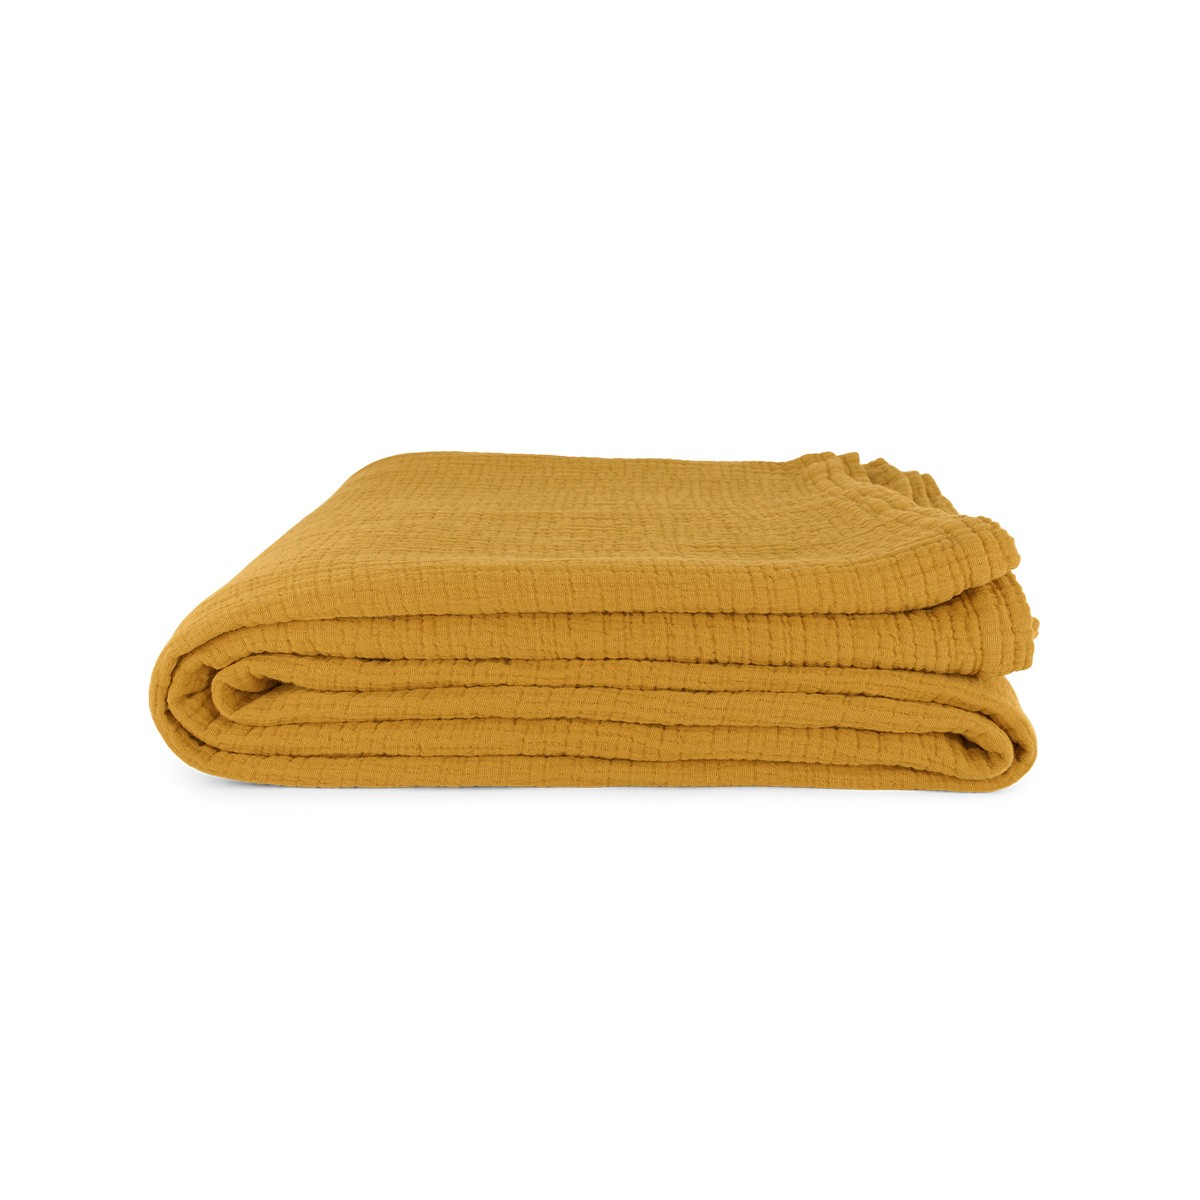 Allegra Tablecloth in Mustard Cotton Gauze